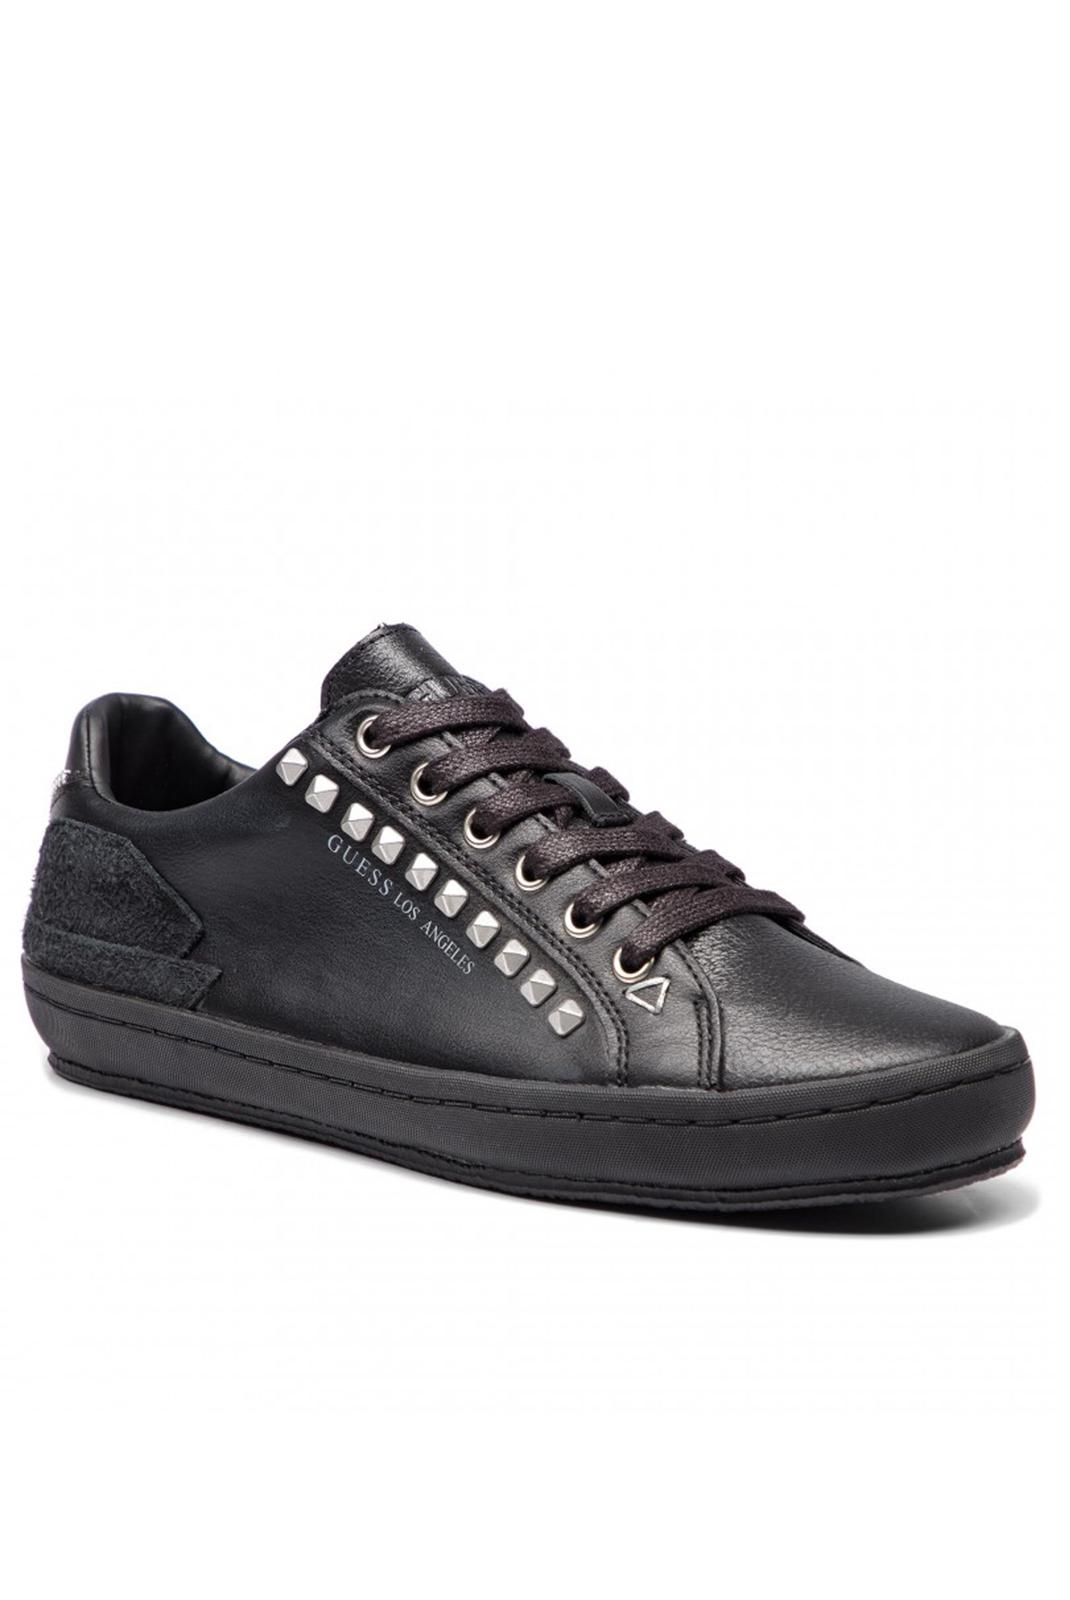 Baskets / Sport  Guess jeans FMLOW4 ELE12 BLACK